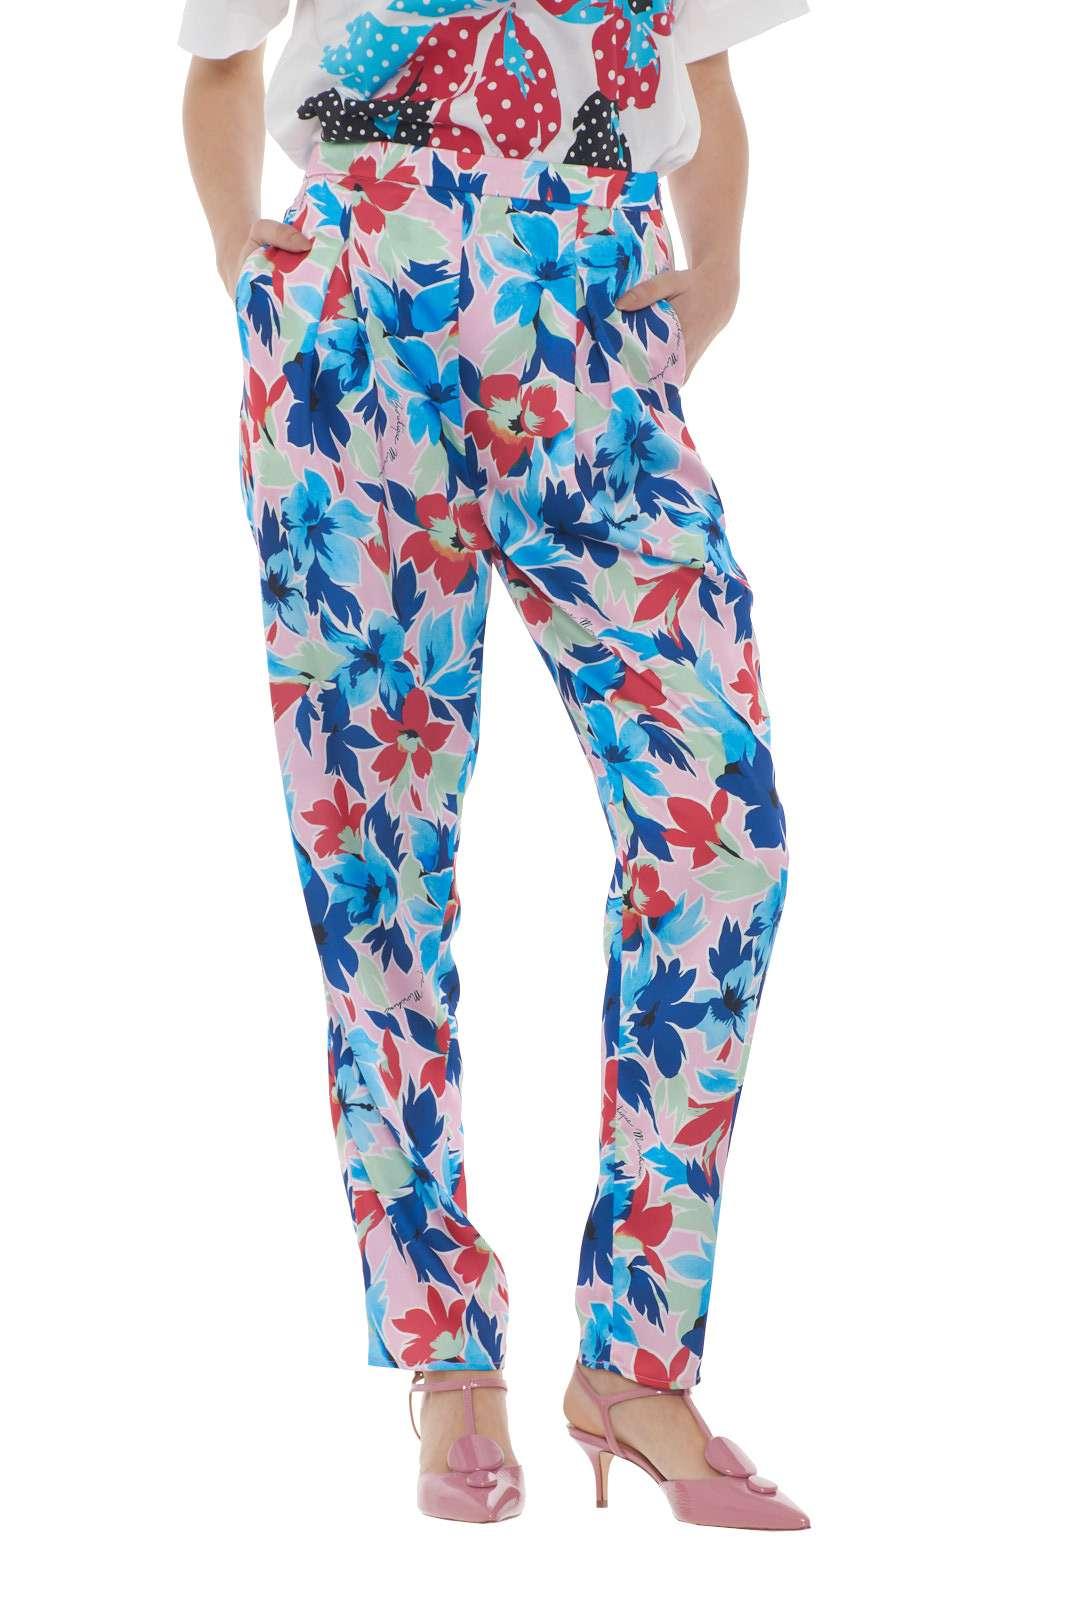 https://www.parmax.com/media/catalog/product/a/i/PE-outlet_parmax-pantaloni-donna-Moschino-a0302%201152-A.jpg